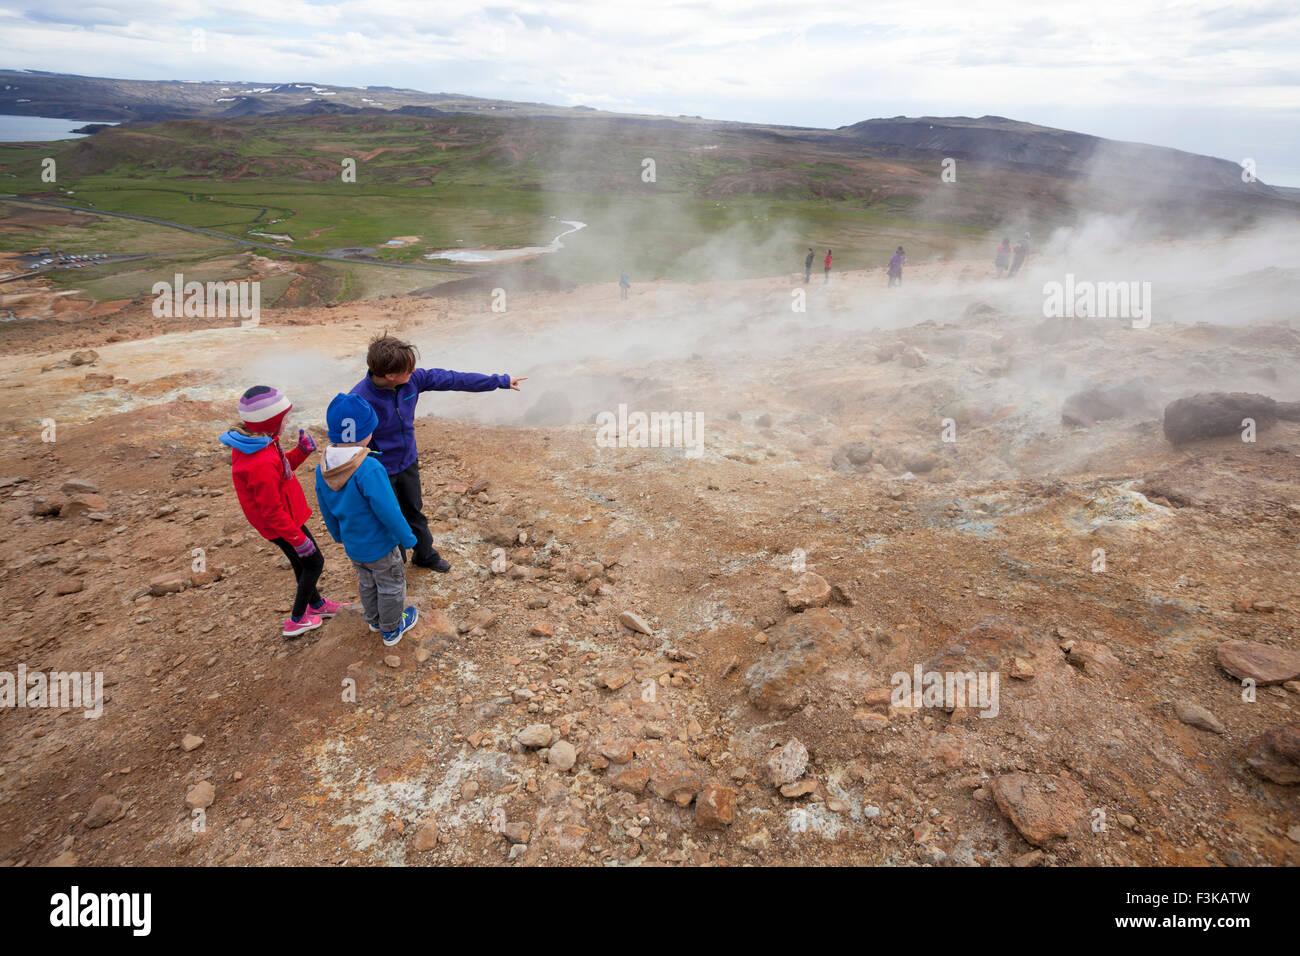 Visitors beside steaming volcanic vents at Seltun, Krysuvik geothermal area, Reykjanes Peninsula, Iceland. - Stock Image